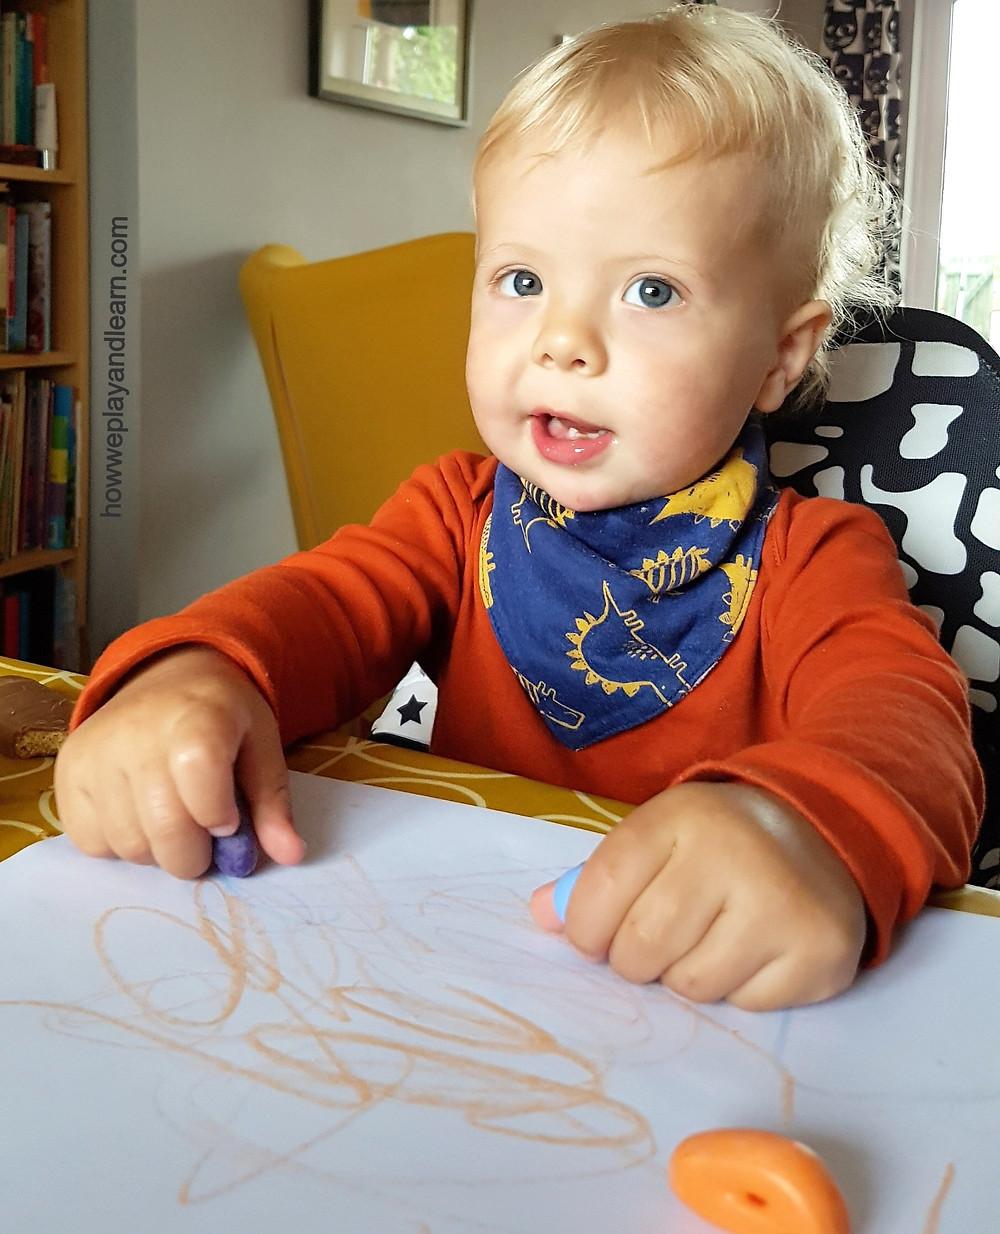 Blond toddler mark-making with Crayon Rocks